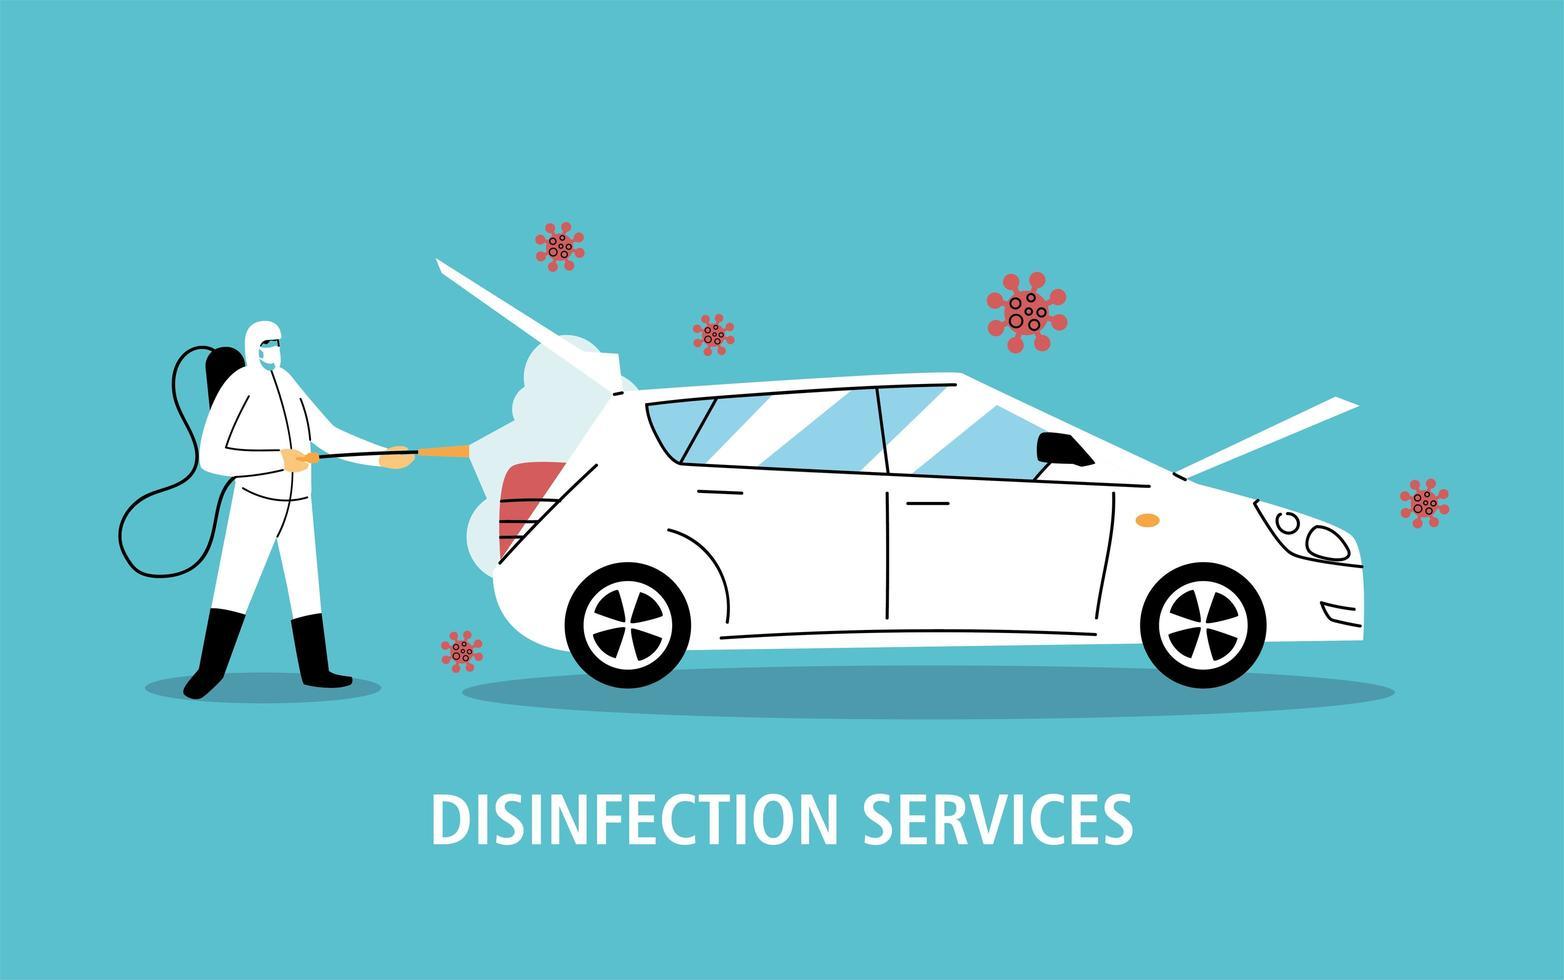 Servicio de desinfección de vehículos por coronavirus o covid 19 vector